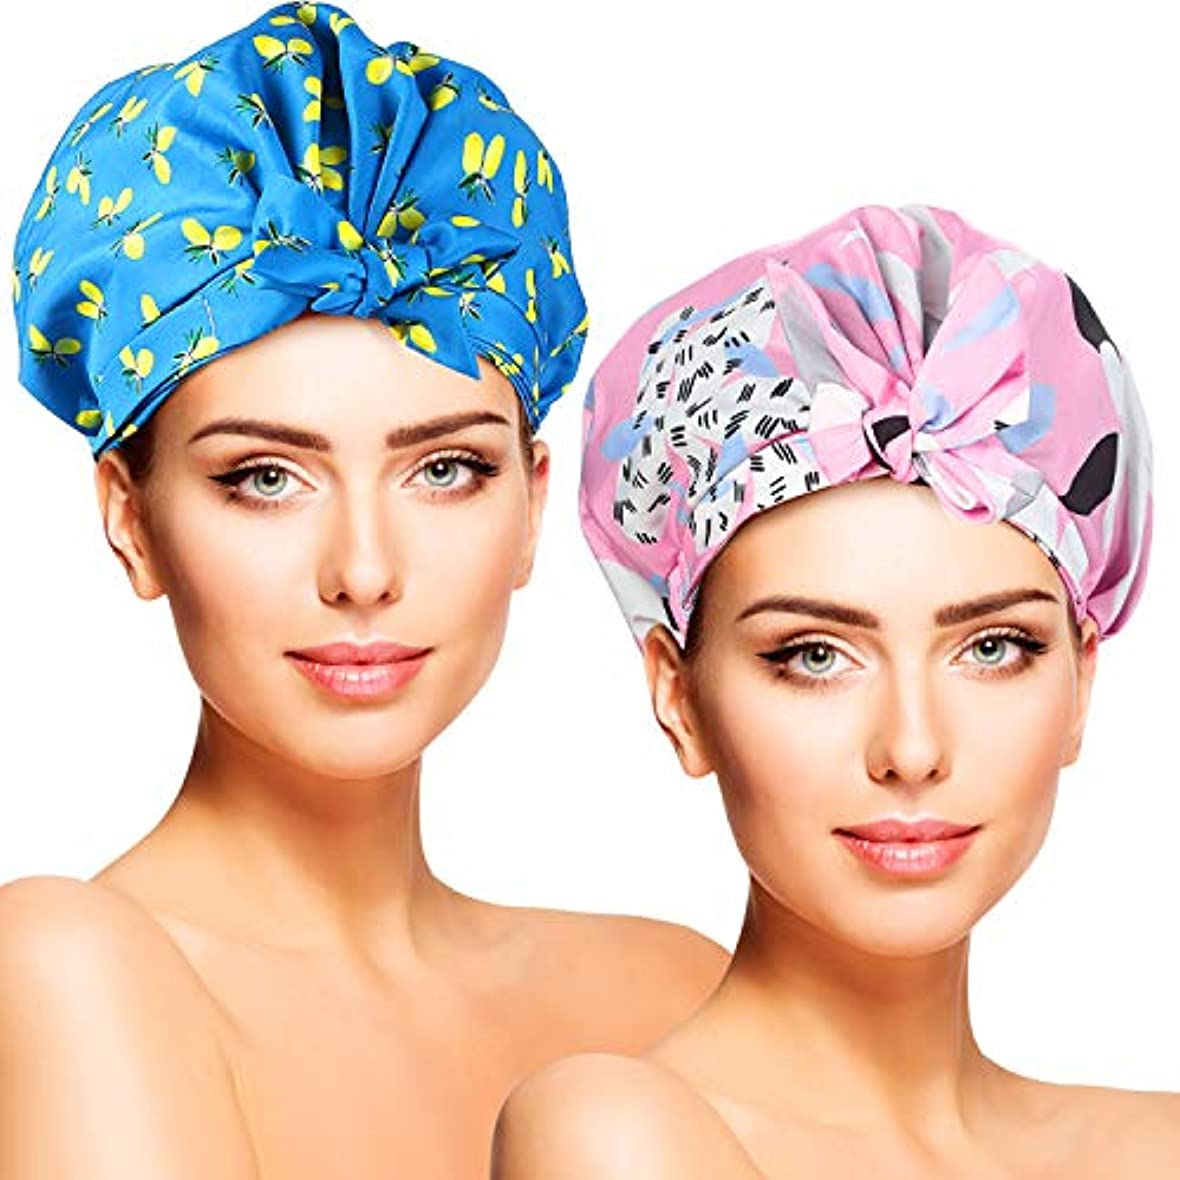 YISUN シャワーキャップ 2枚セット 二重層防水 耐久性 抗菌性 お風呂 シャワー SPA 調理 洗顔用 多機能 実用性 男女兼用